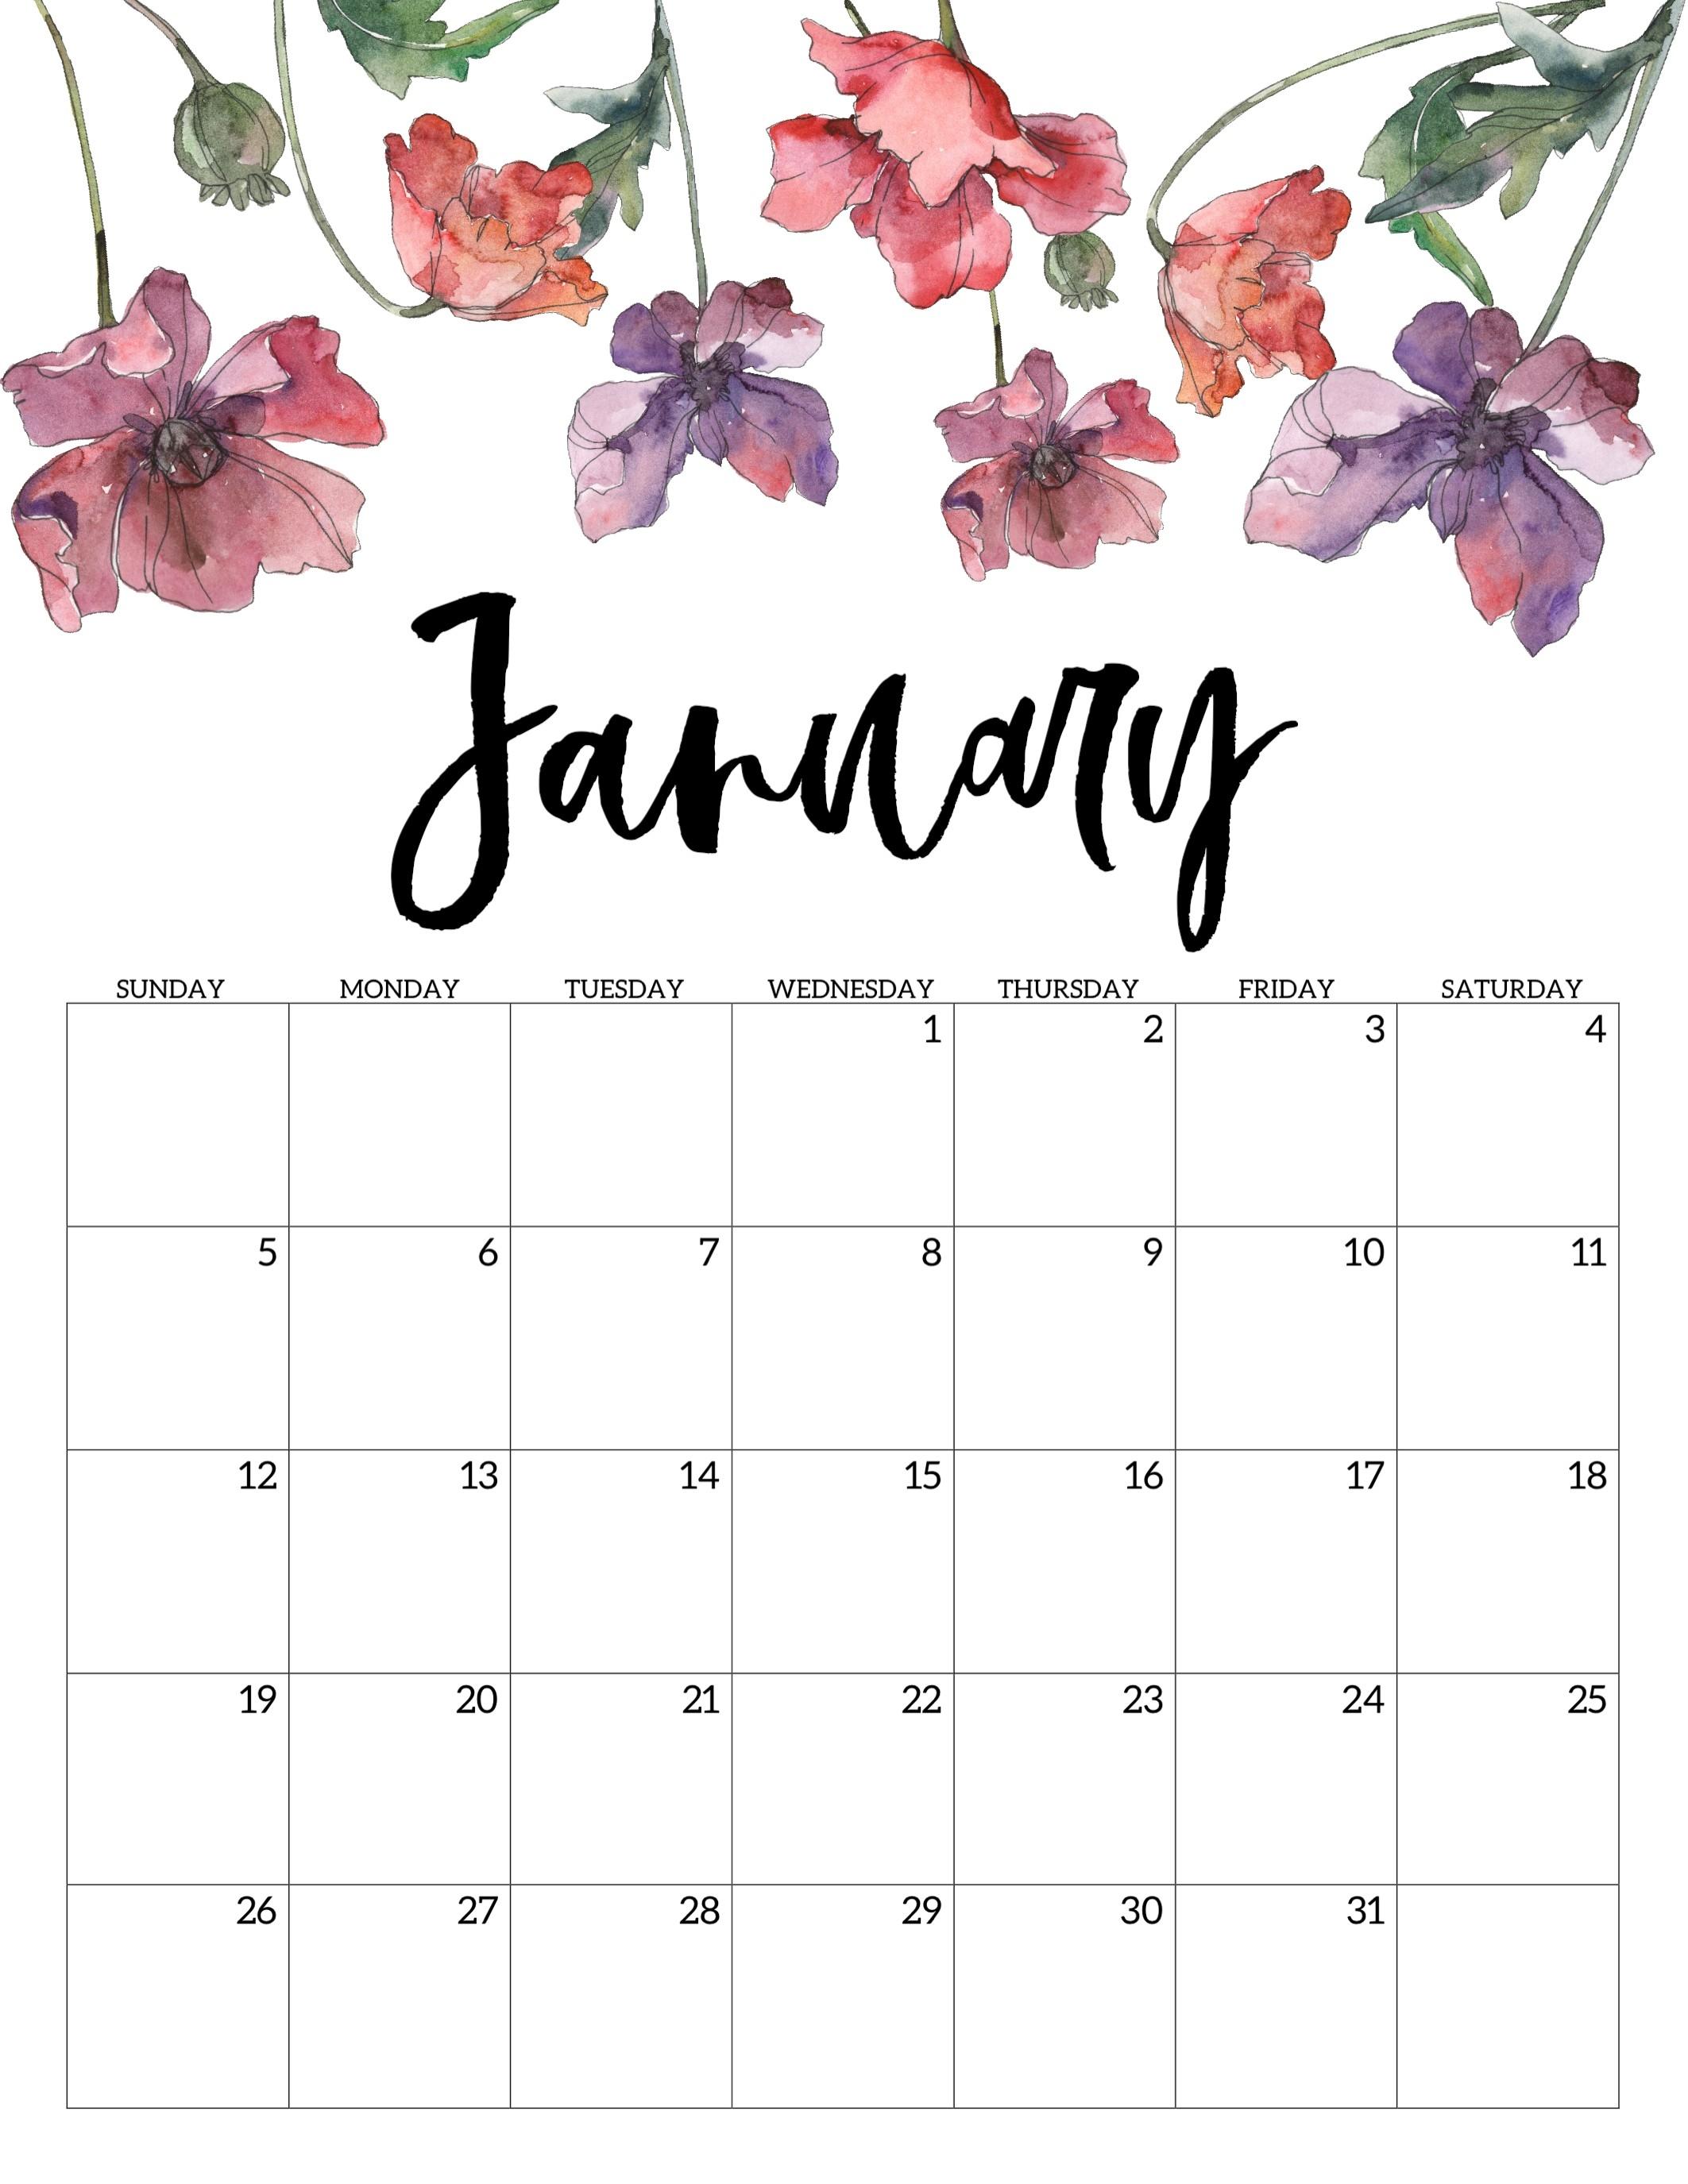 2020 Free Printable Calendar - Floral - Paper Trail Design-January 2020 Calendar Cute